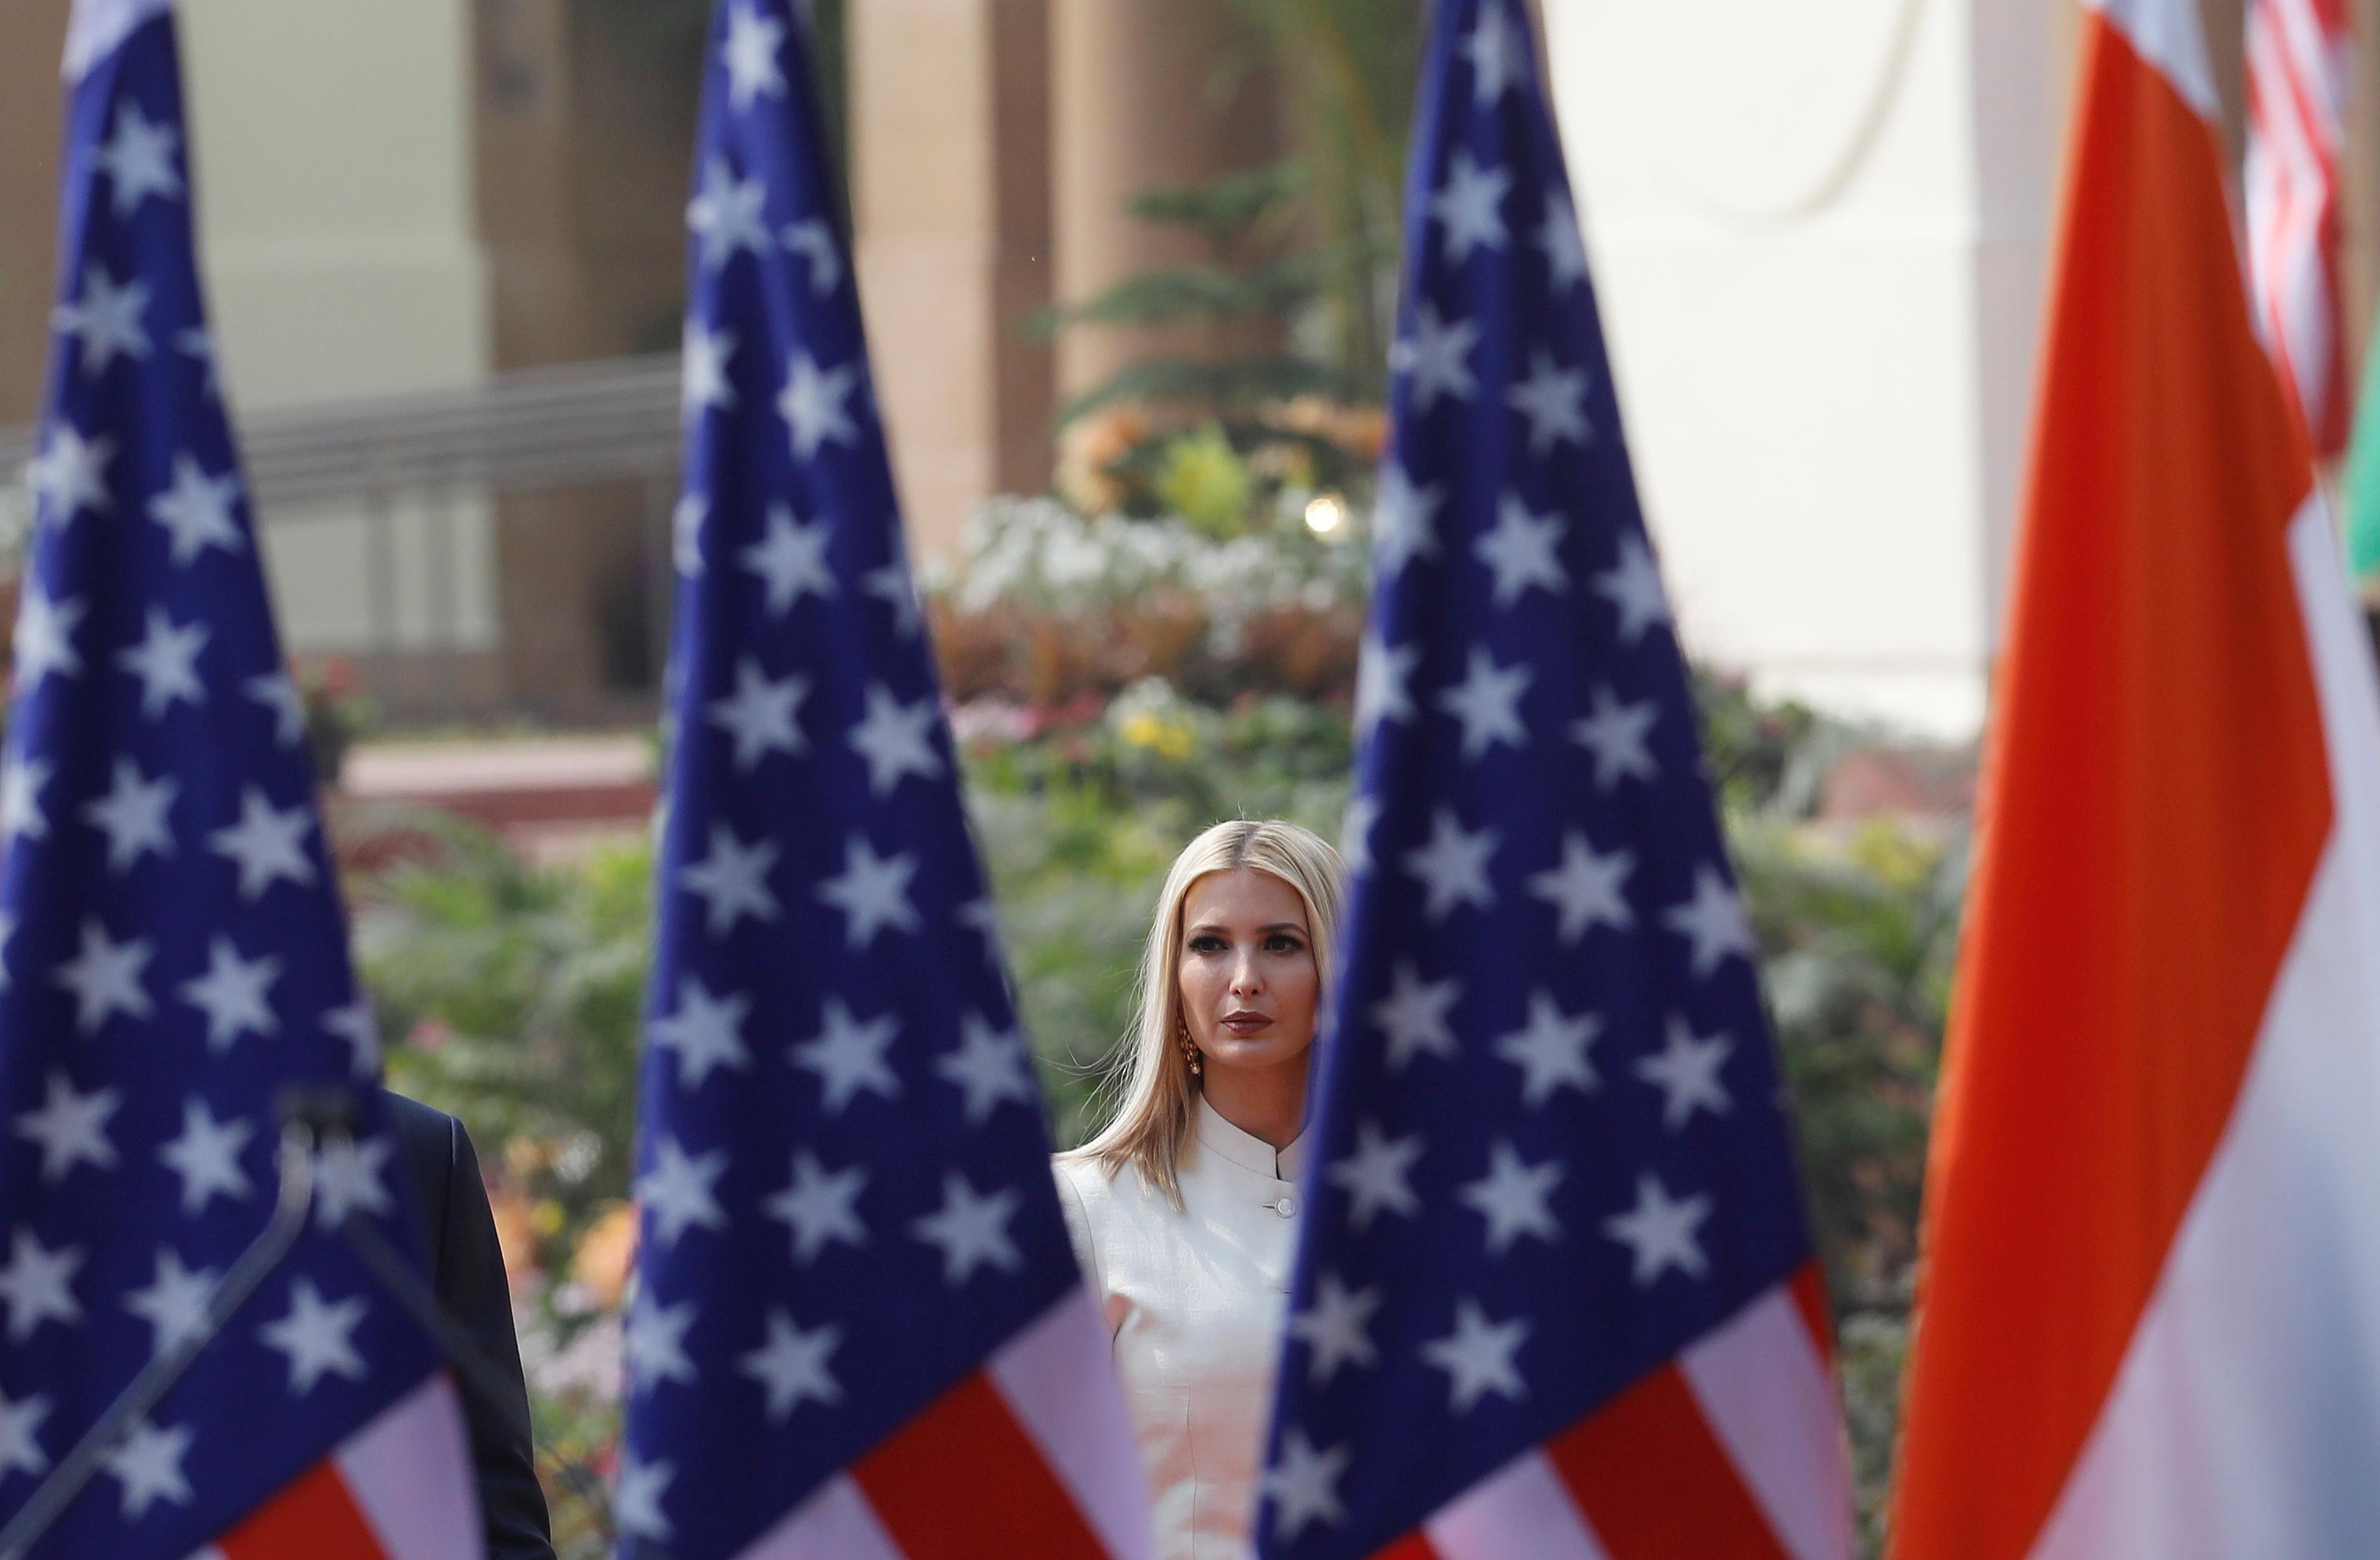 La hija del presidente de EEUU, Ivanka Trump